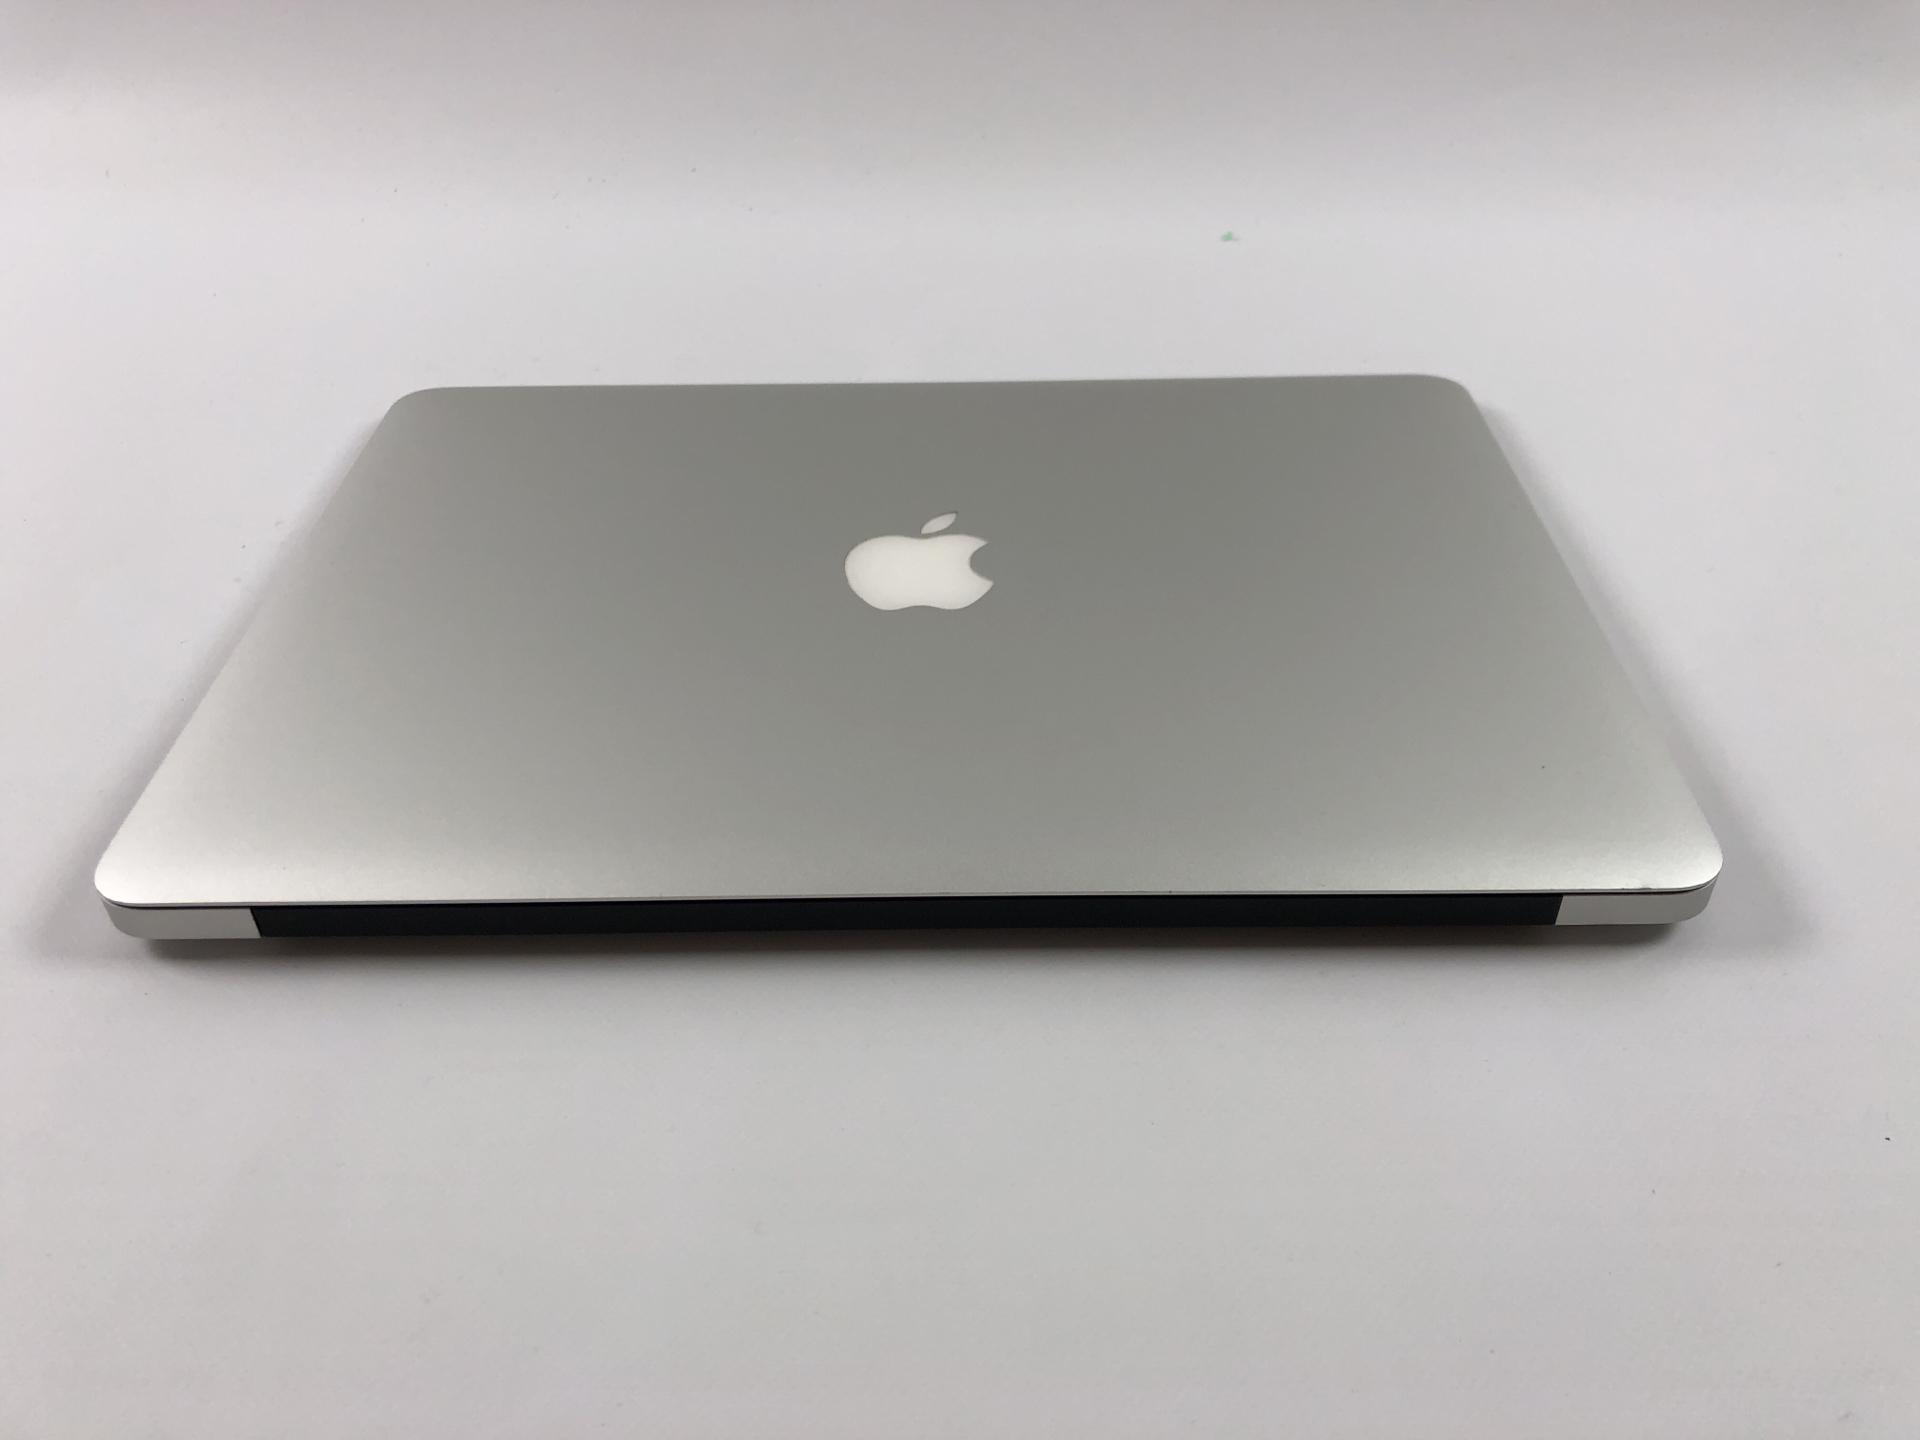 "MacBook Air 13"" Early 2015 (Intel Core i5 1.6 GHz 4 GB RAM 128 GB SSD), Intel Core i5 1.6 GHz, 4 GB RAM, 128 GB SSD, Kuva 2"